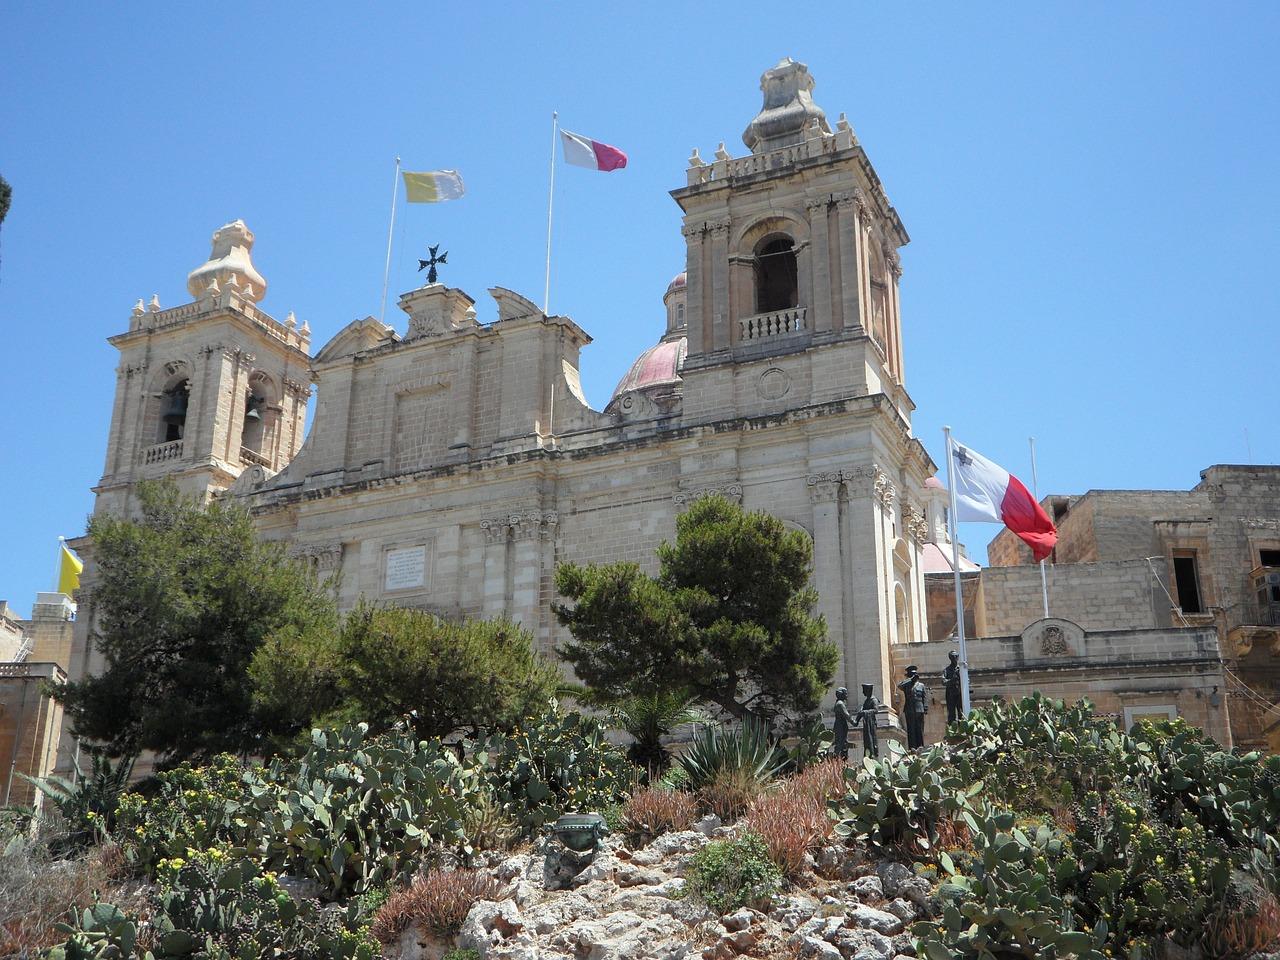 Malta Ozgurluk Gunu (Freedom Day)